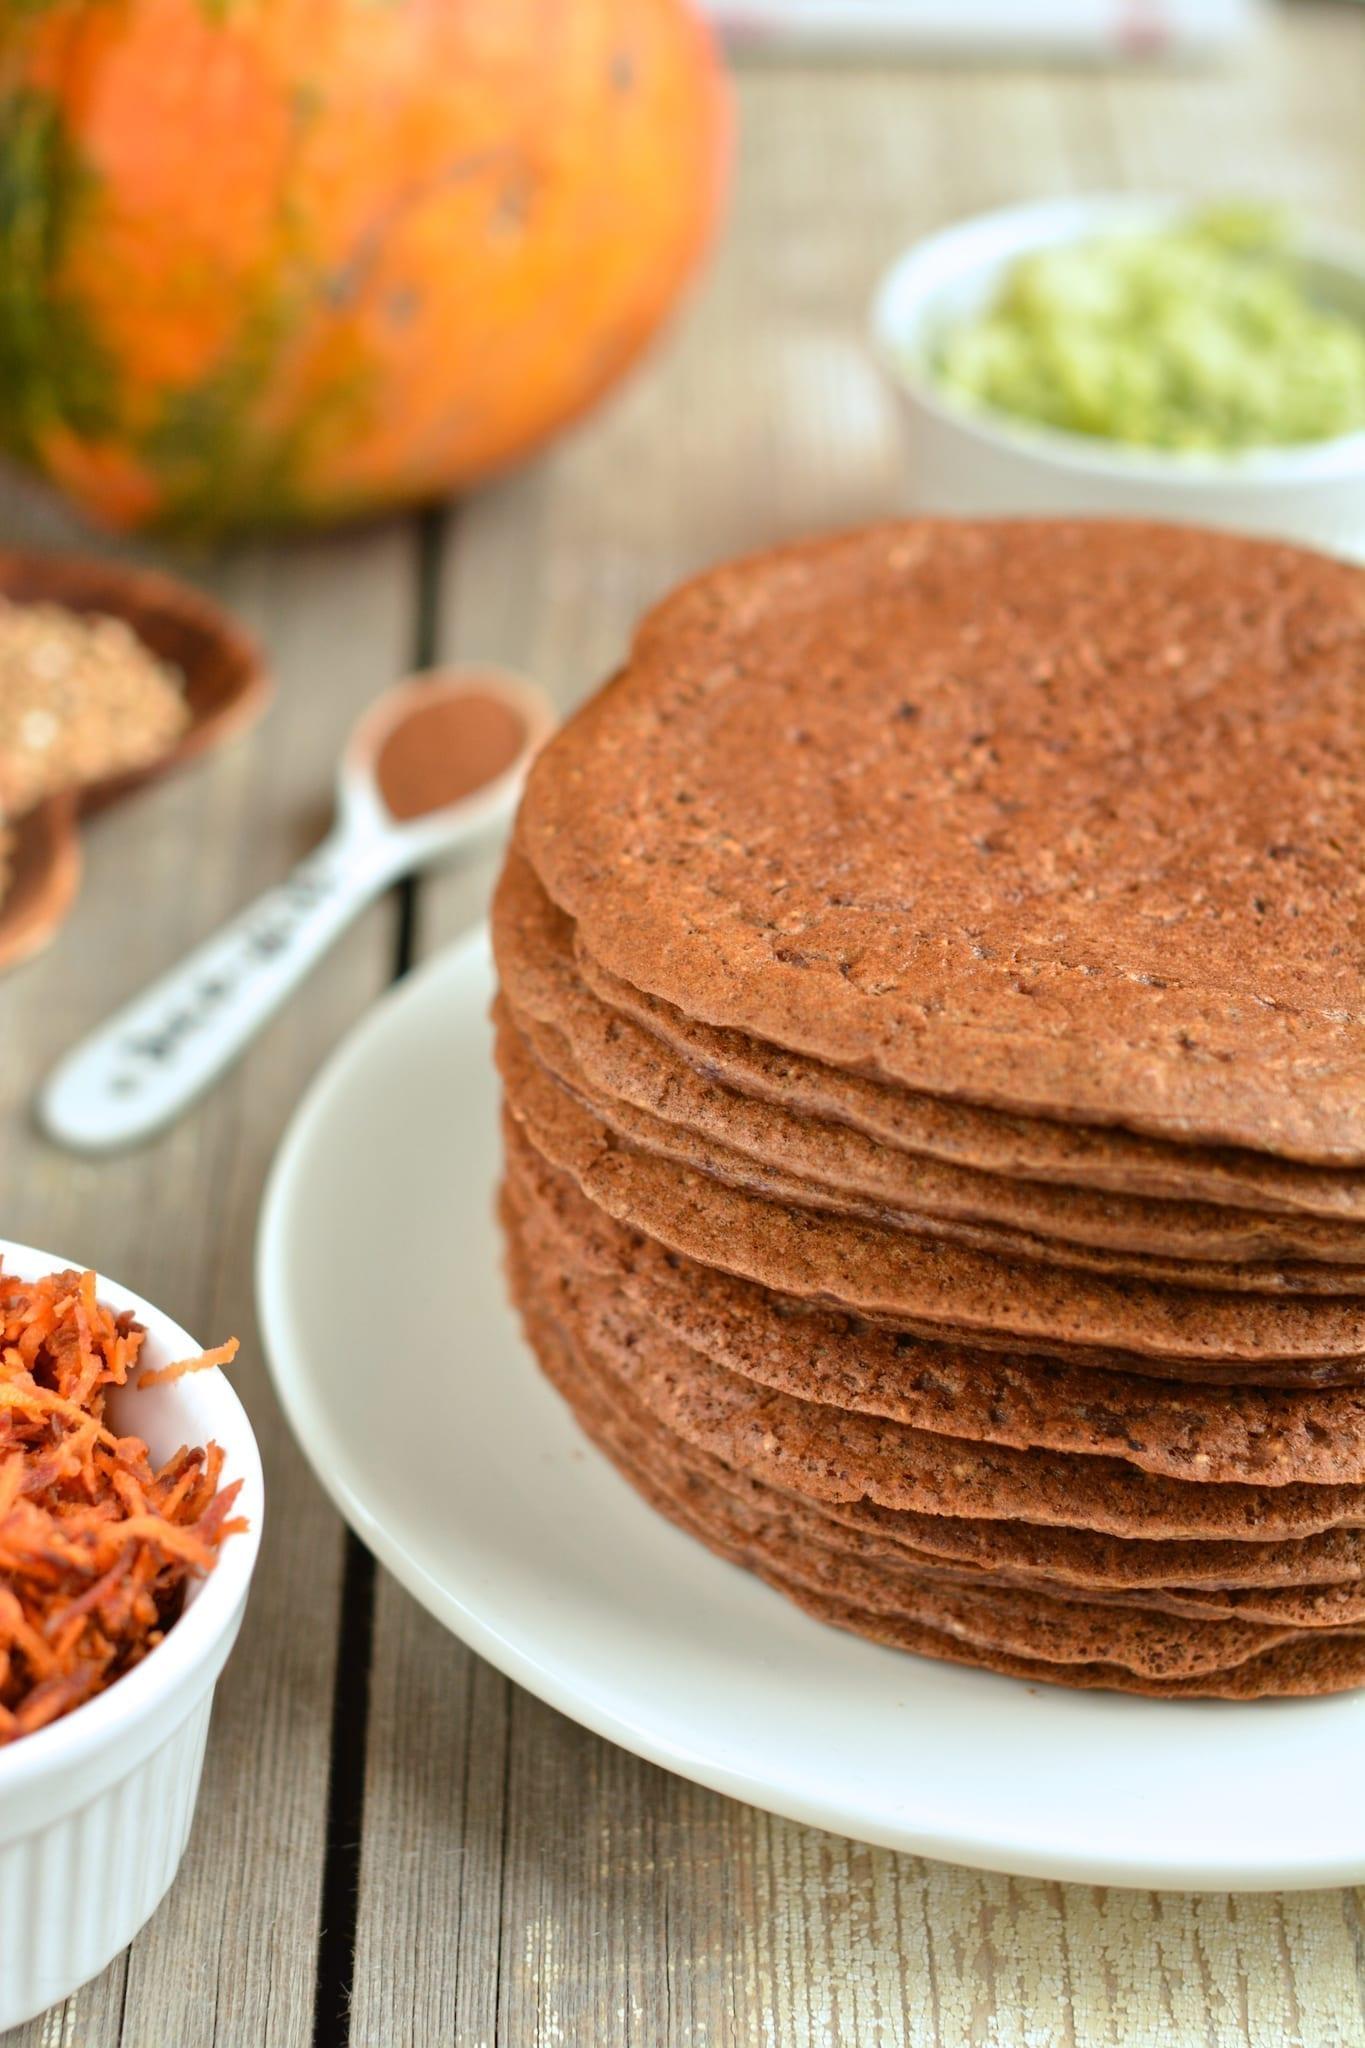 Fluffy Buckwheat-Oat Bran Pancakes with Grated Veggies